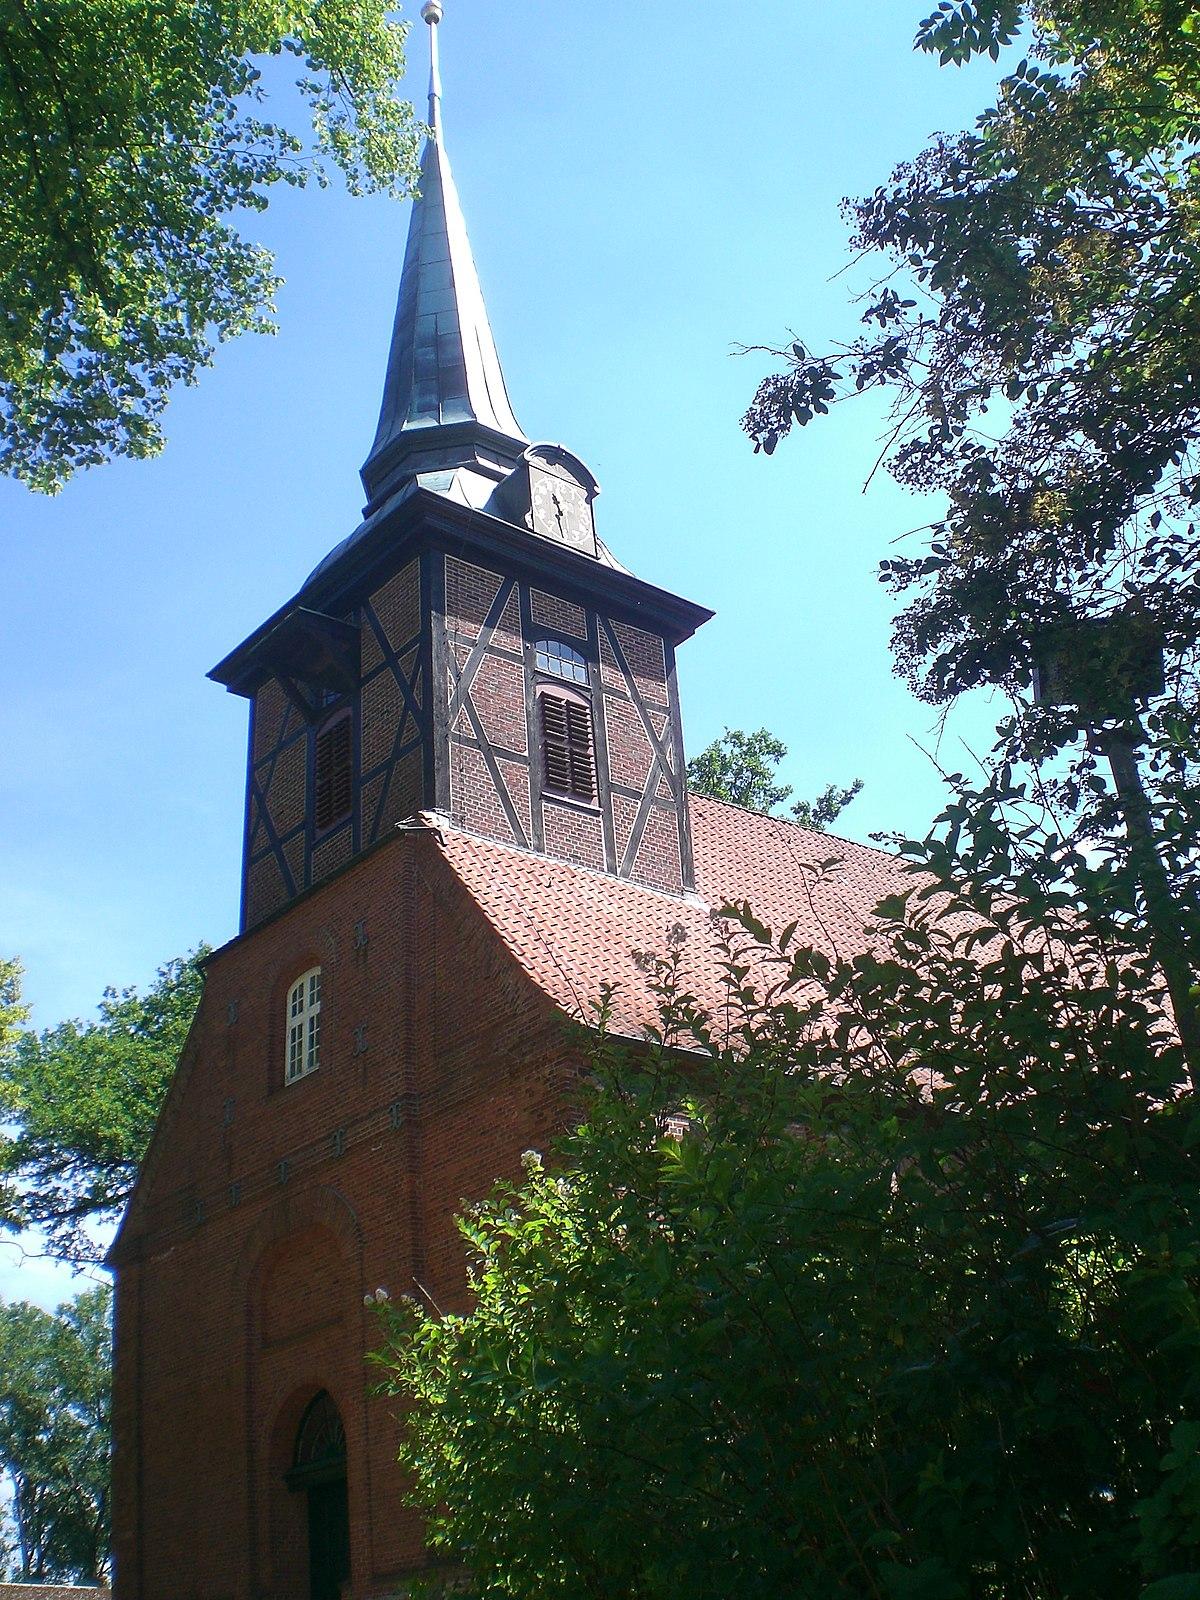 bergstedt wikipedia